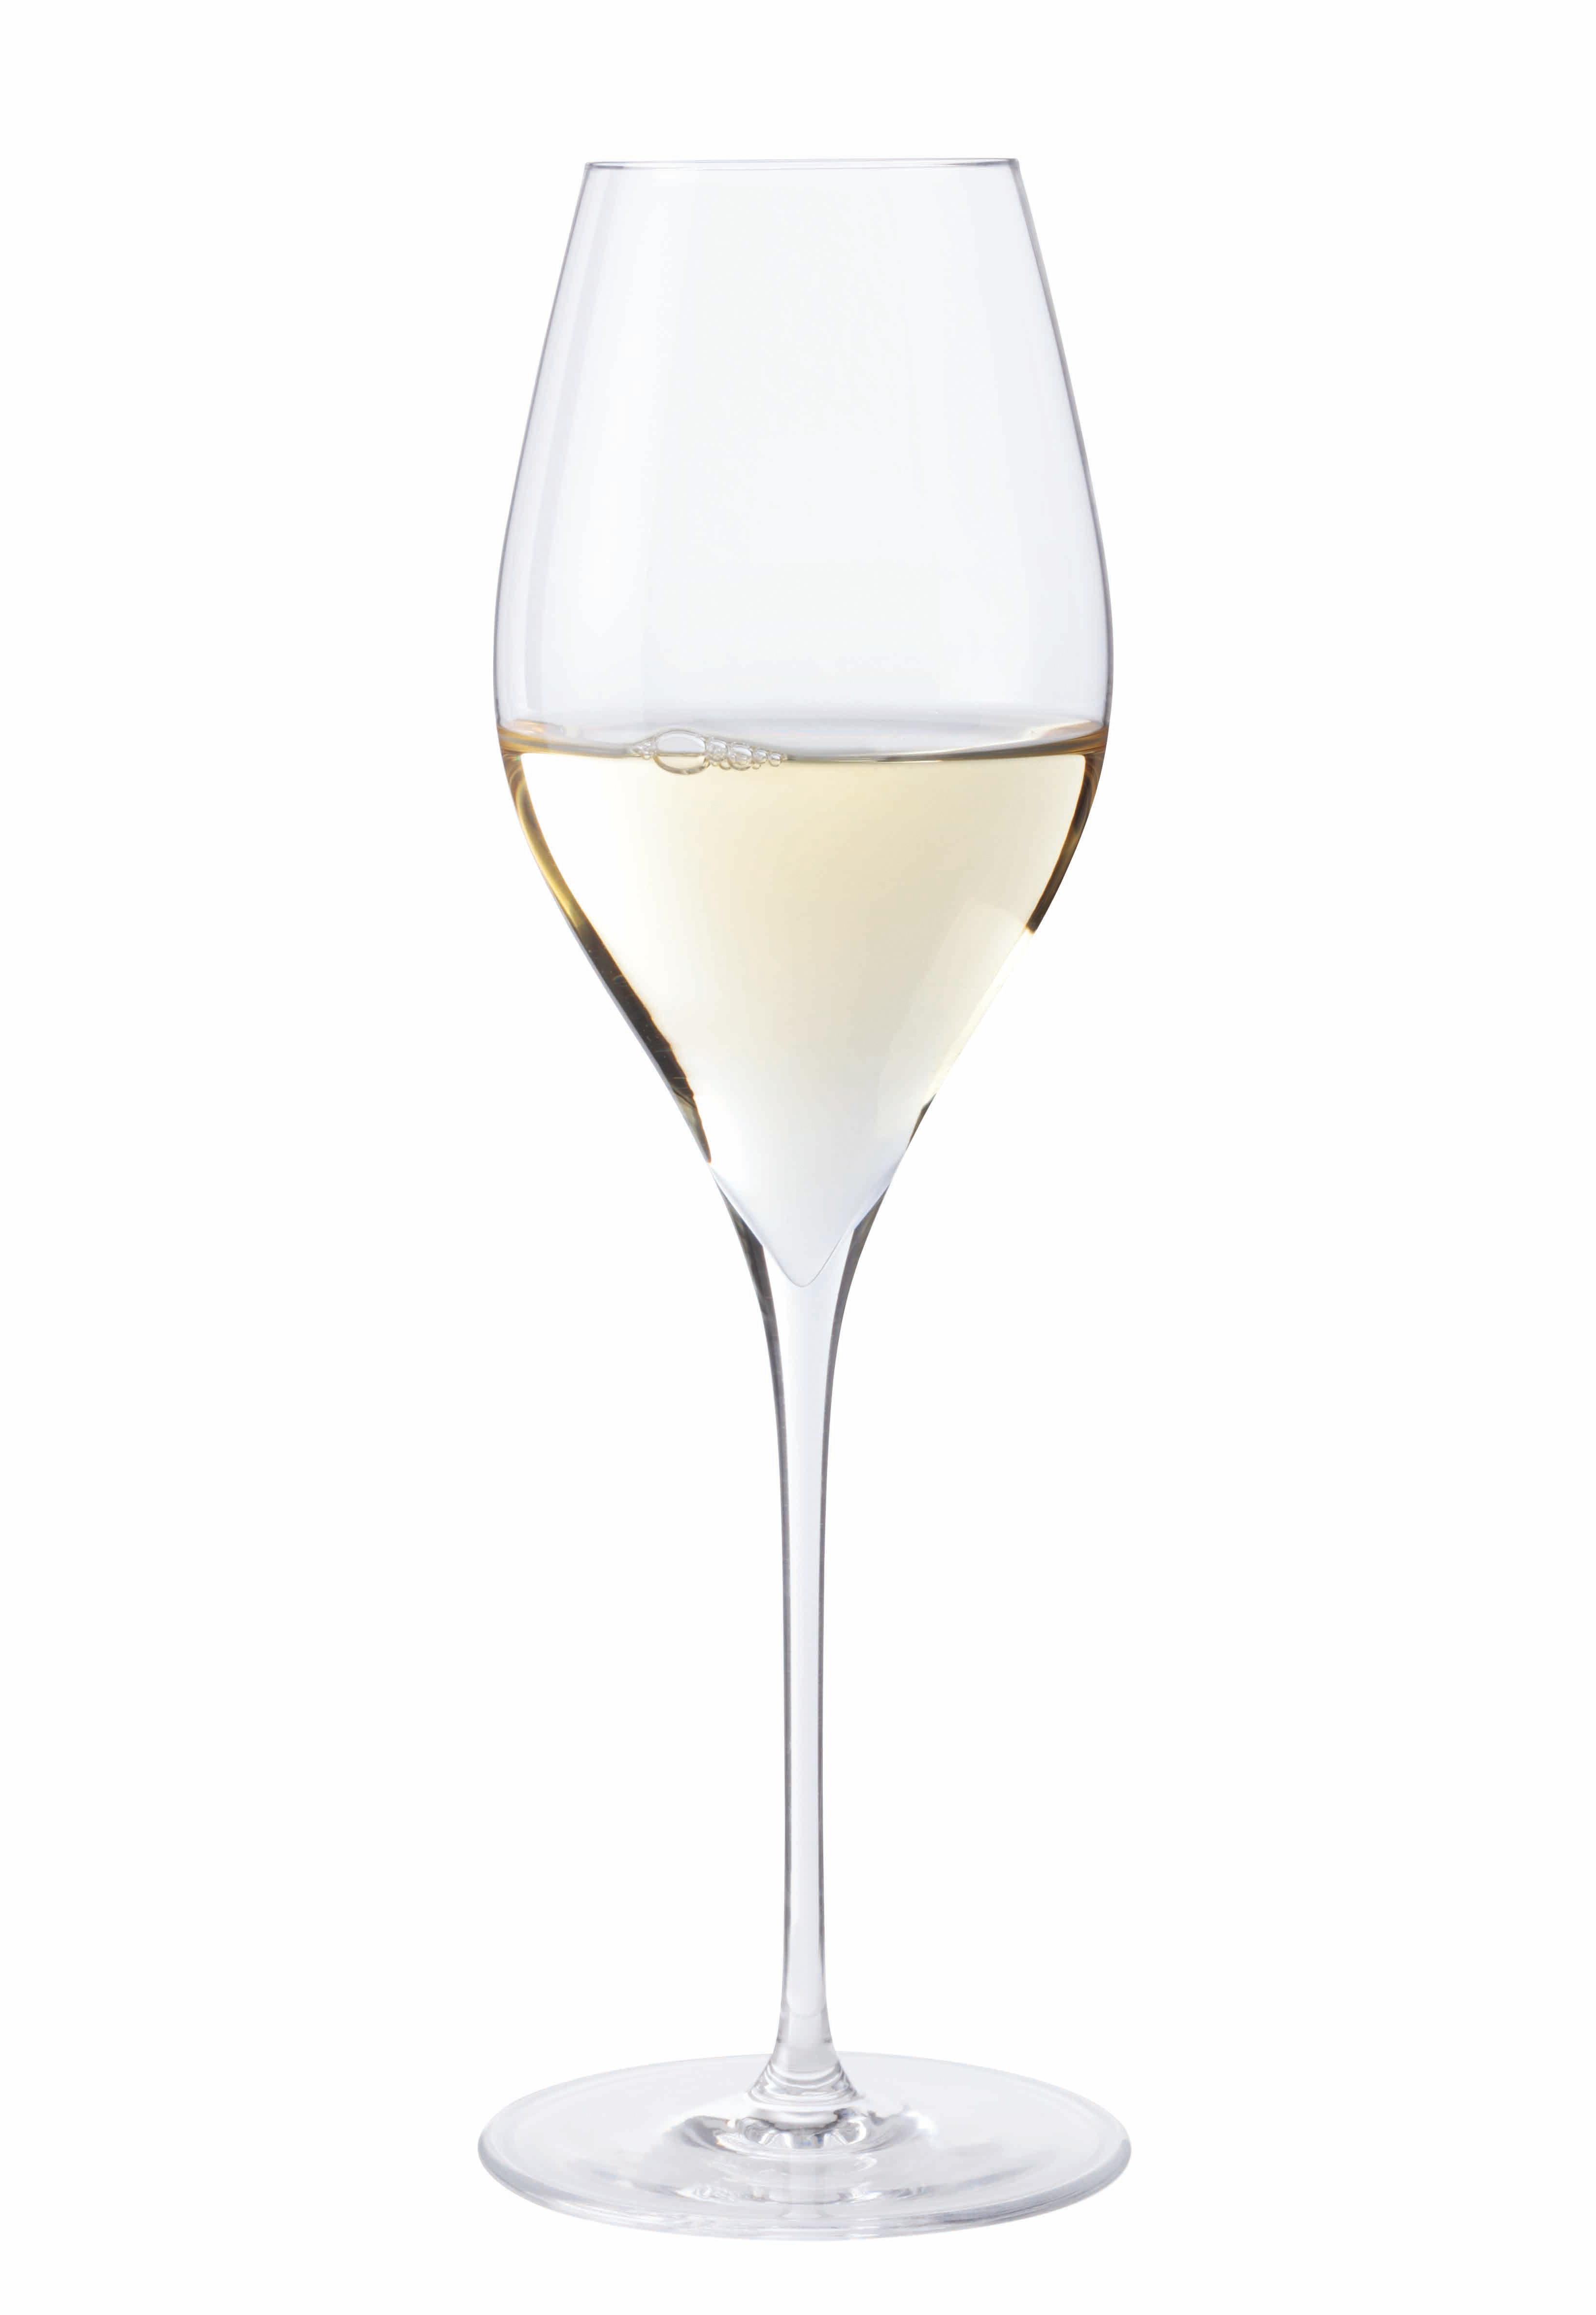 Verre vin rossini pour vin blanc 315 ml 315 ml transparent leonardo - Vin rossini ...